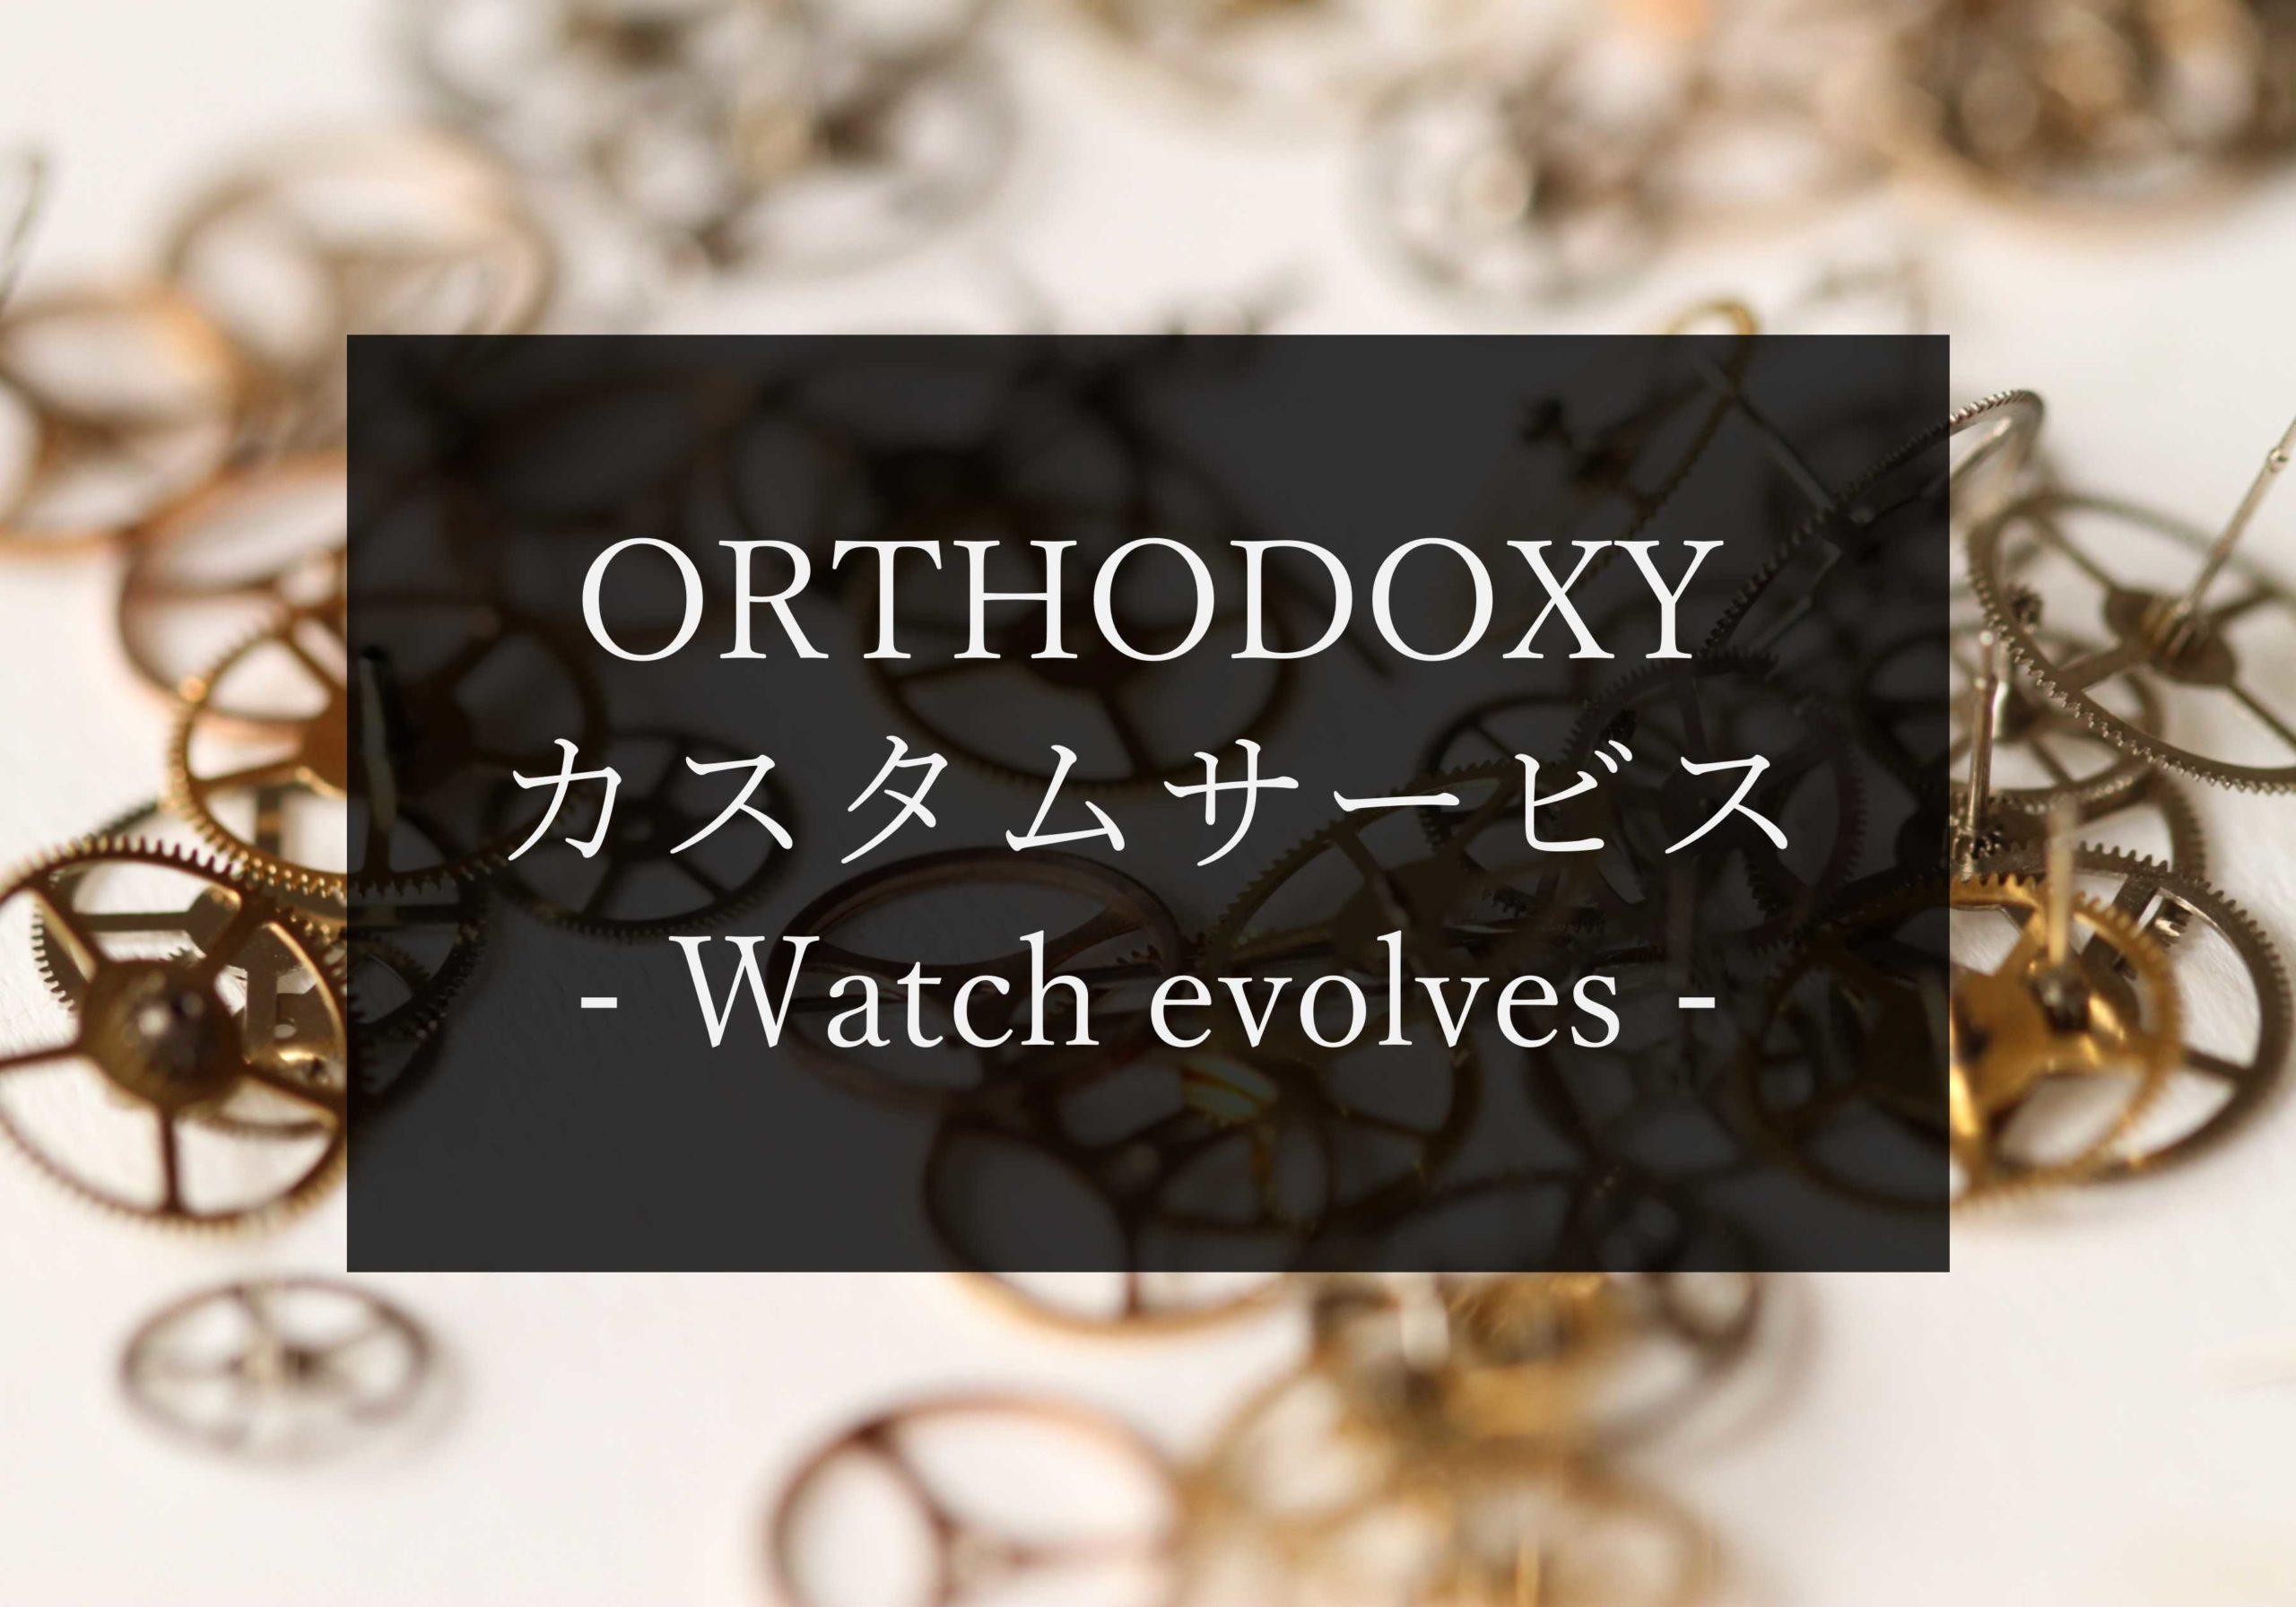 ORTHODOXYカスタムサービス「Watch evolves」